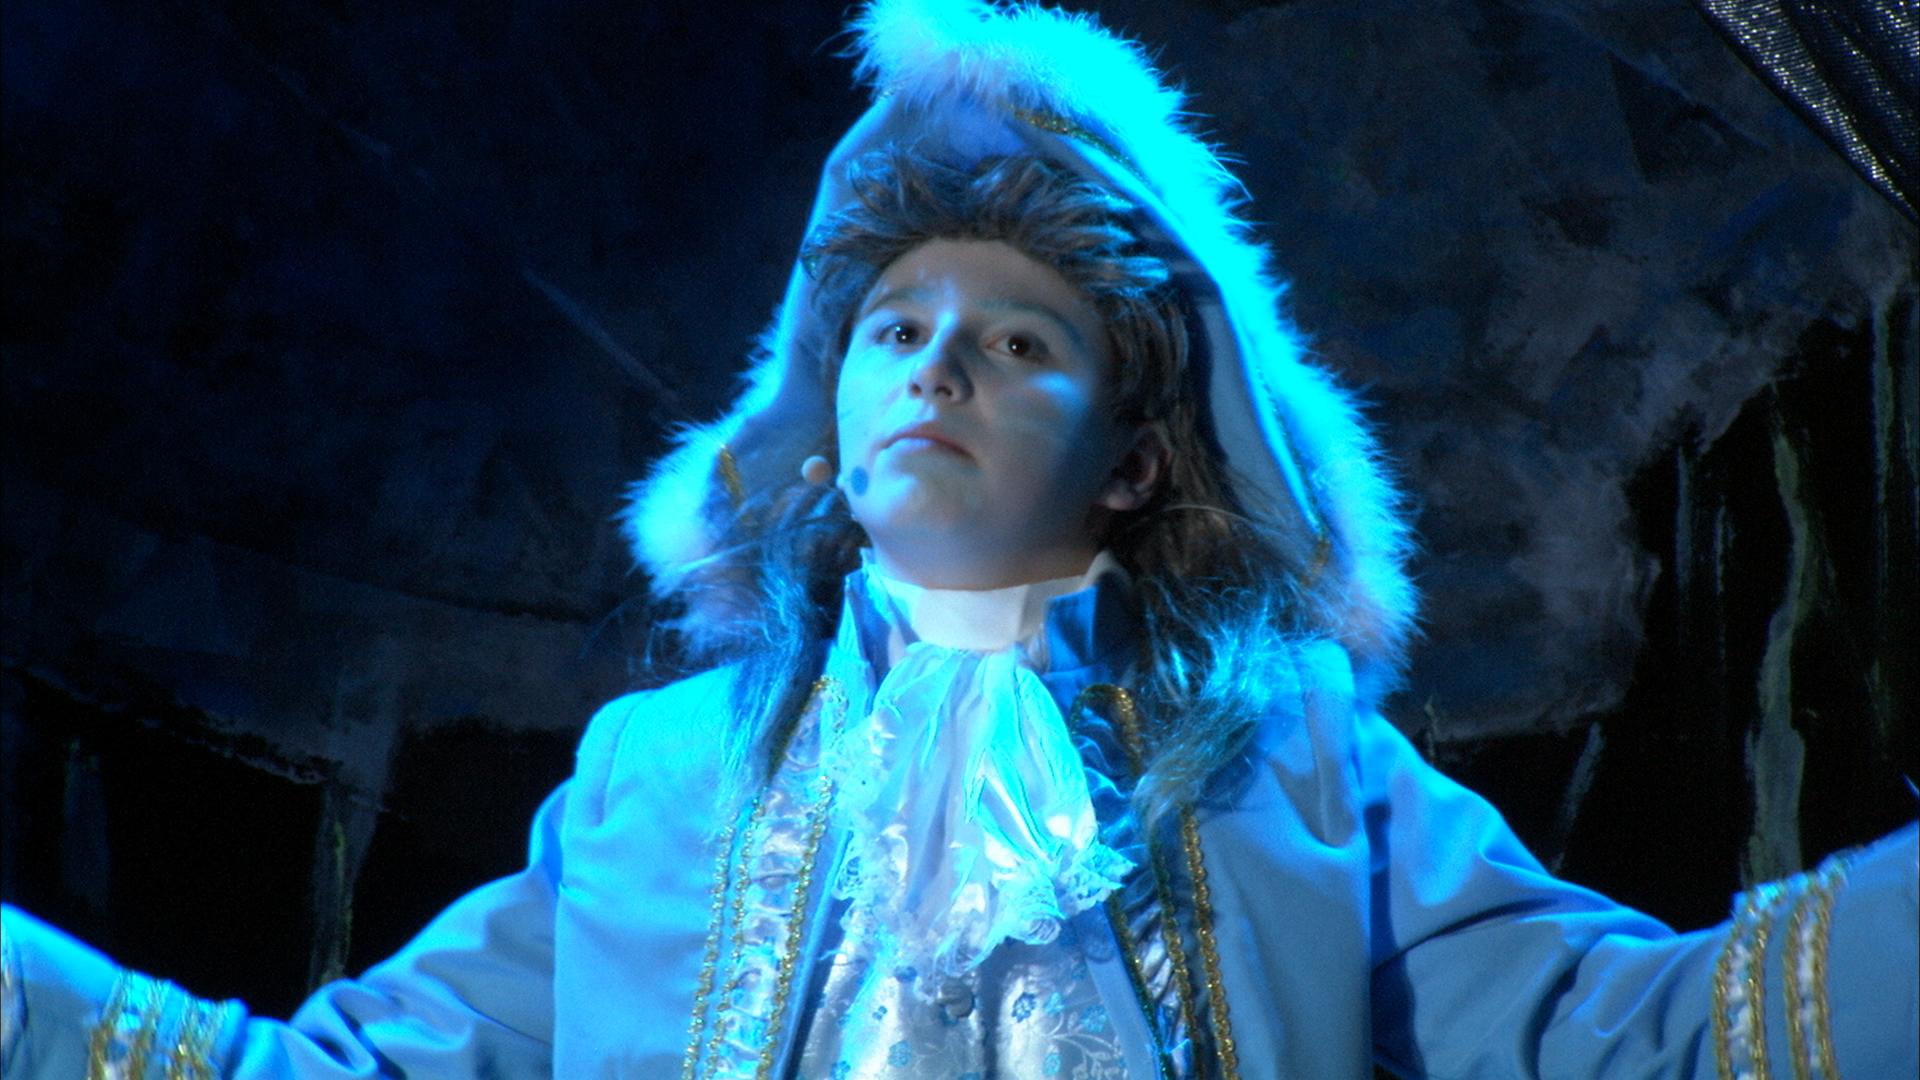 Bühnen-Szene - Der vereiste Prinz